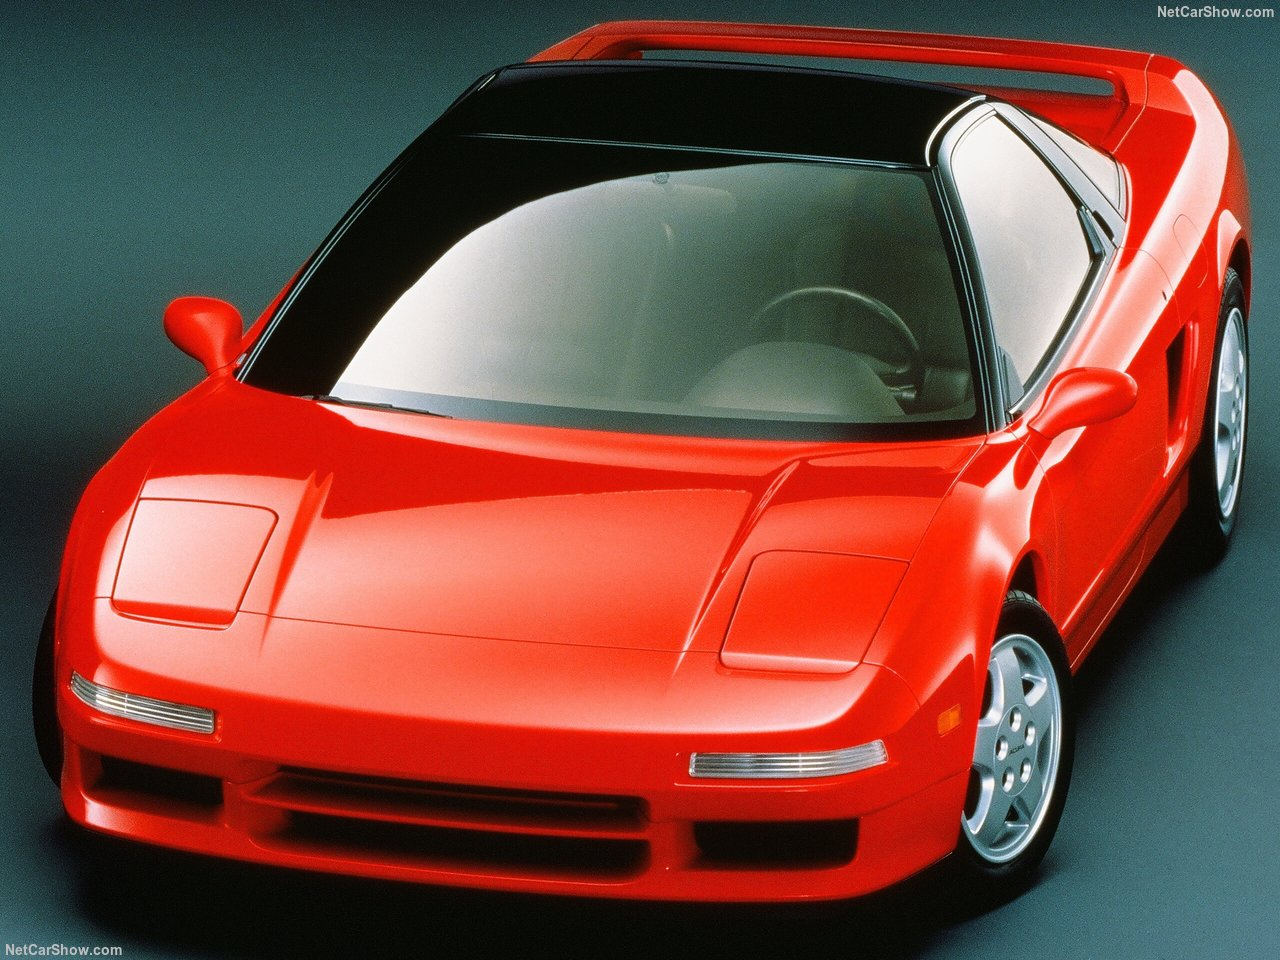 Acura NSX Concept 1989 Acura-NS-X_Concept-1989-1280-02